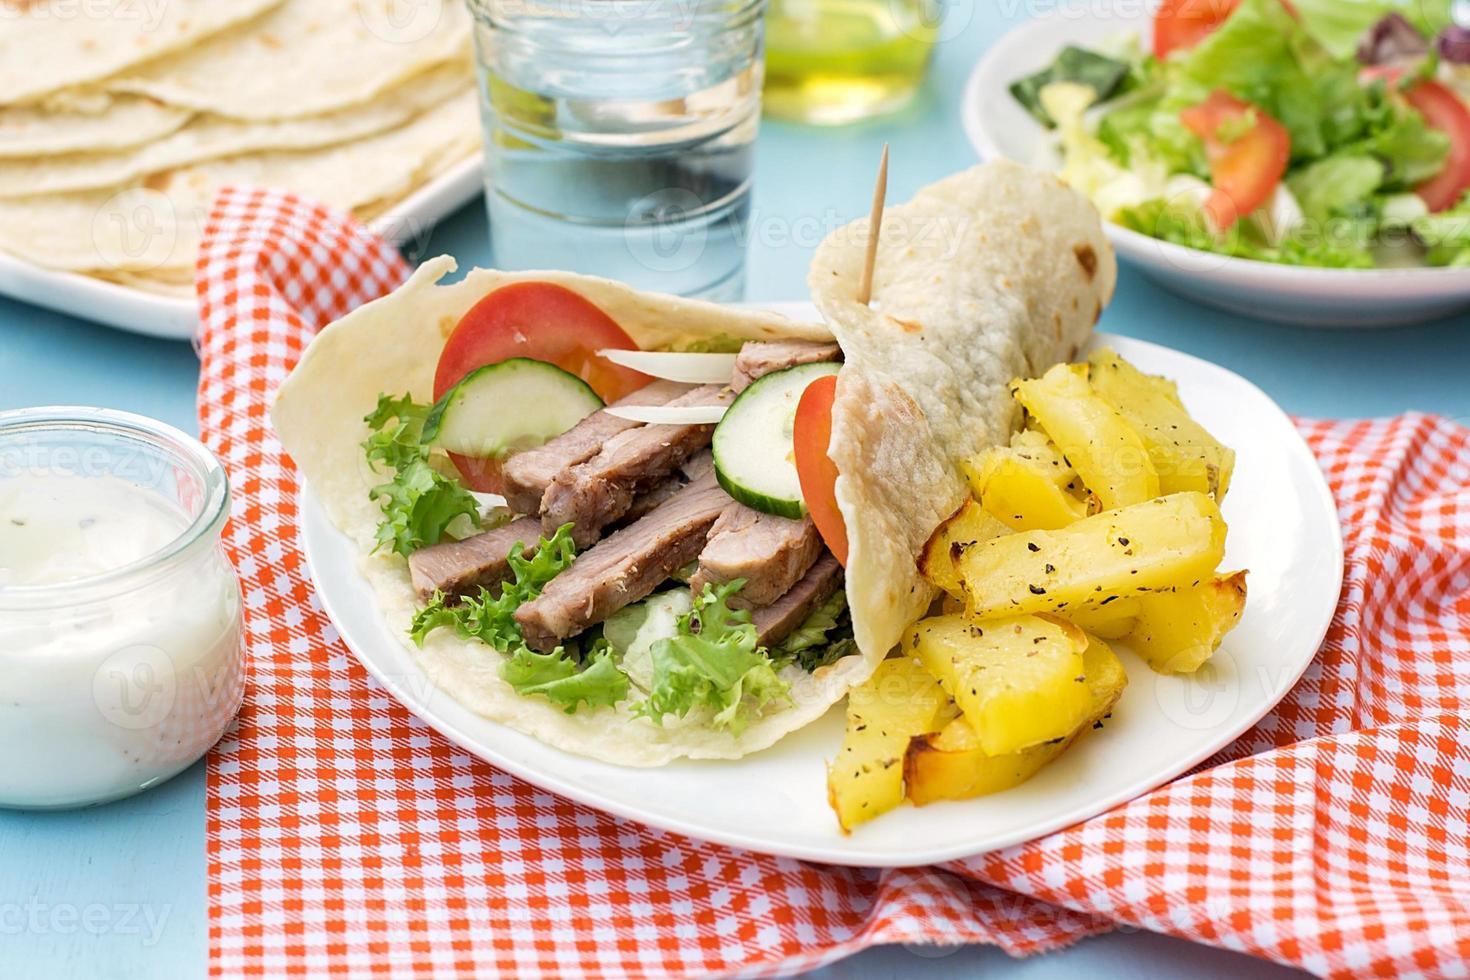 Greek gyros with pork, vegetables and homemade pita bread photo